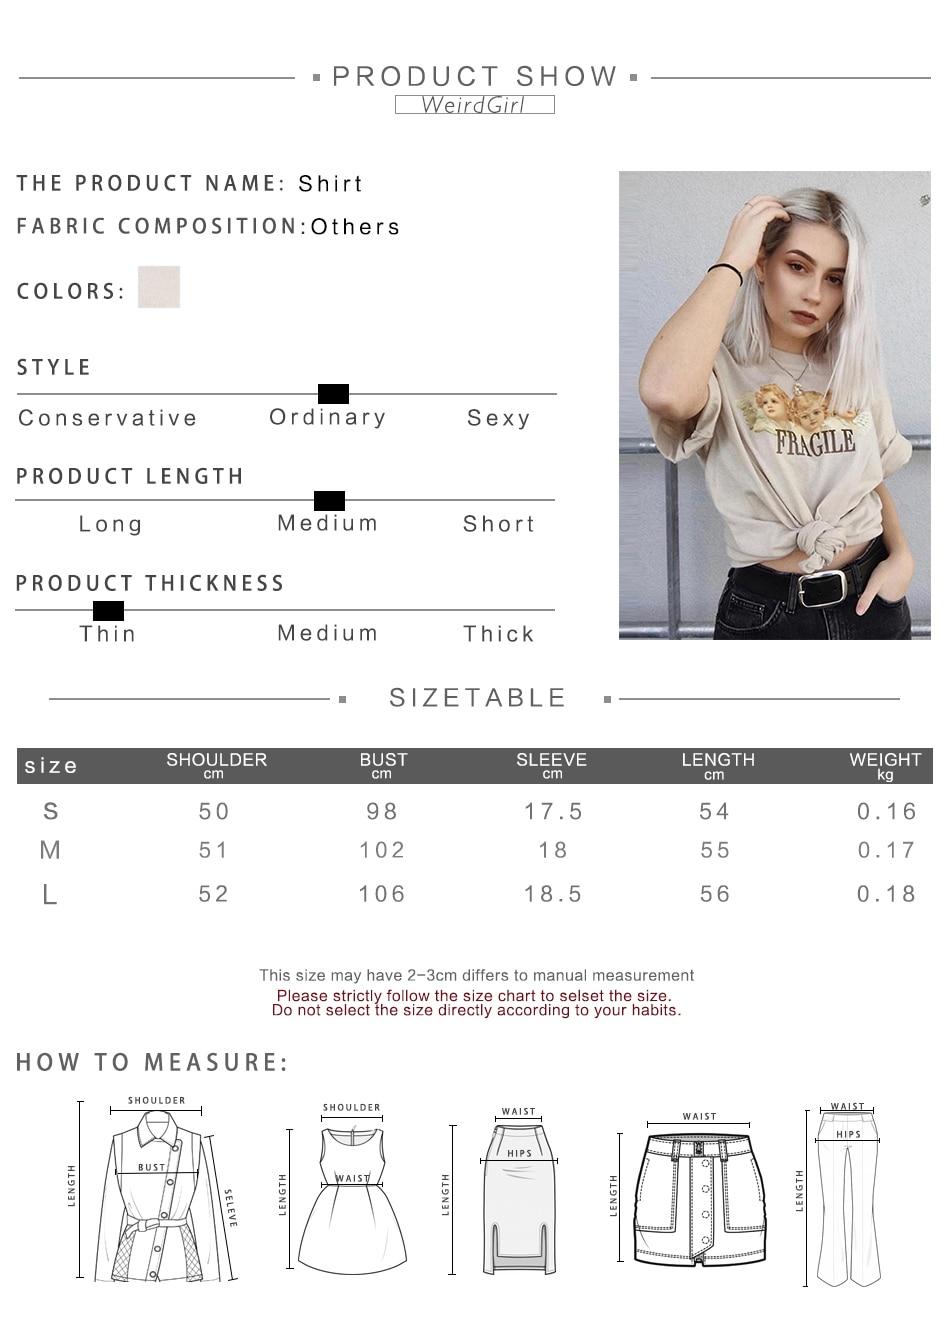 Weirdgirl Women Baby Angel Printing Casual Fashion T-shirts letter Short Sleeve O-Neck Khaki Loose Female Tees Summer New 19 2